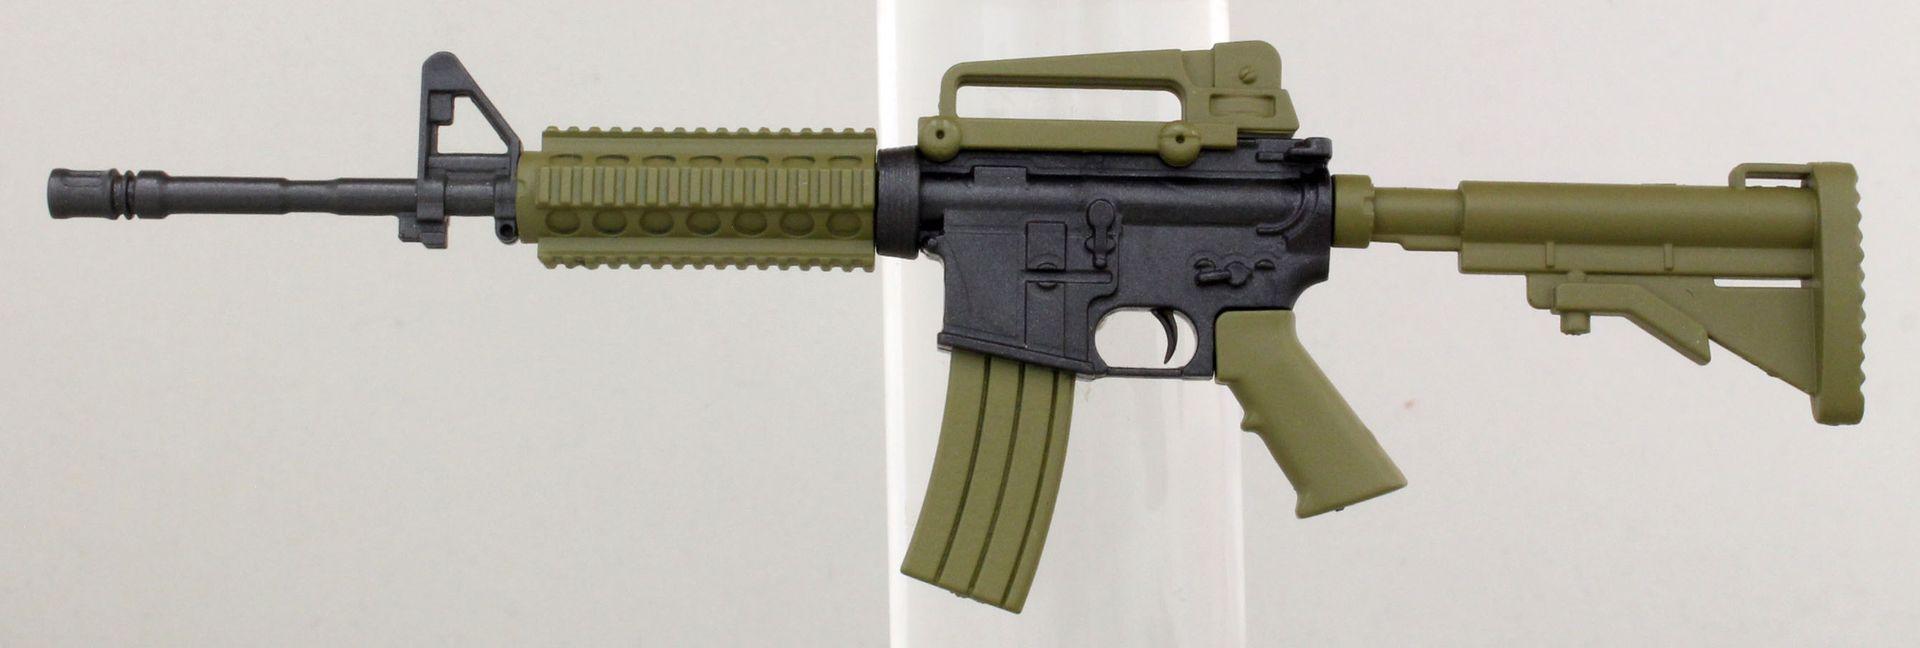 M4 Carbine long stock(ロングストック)